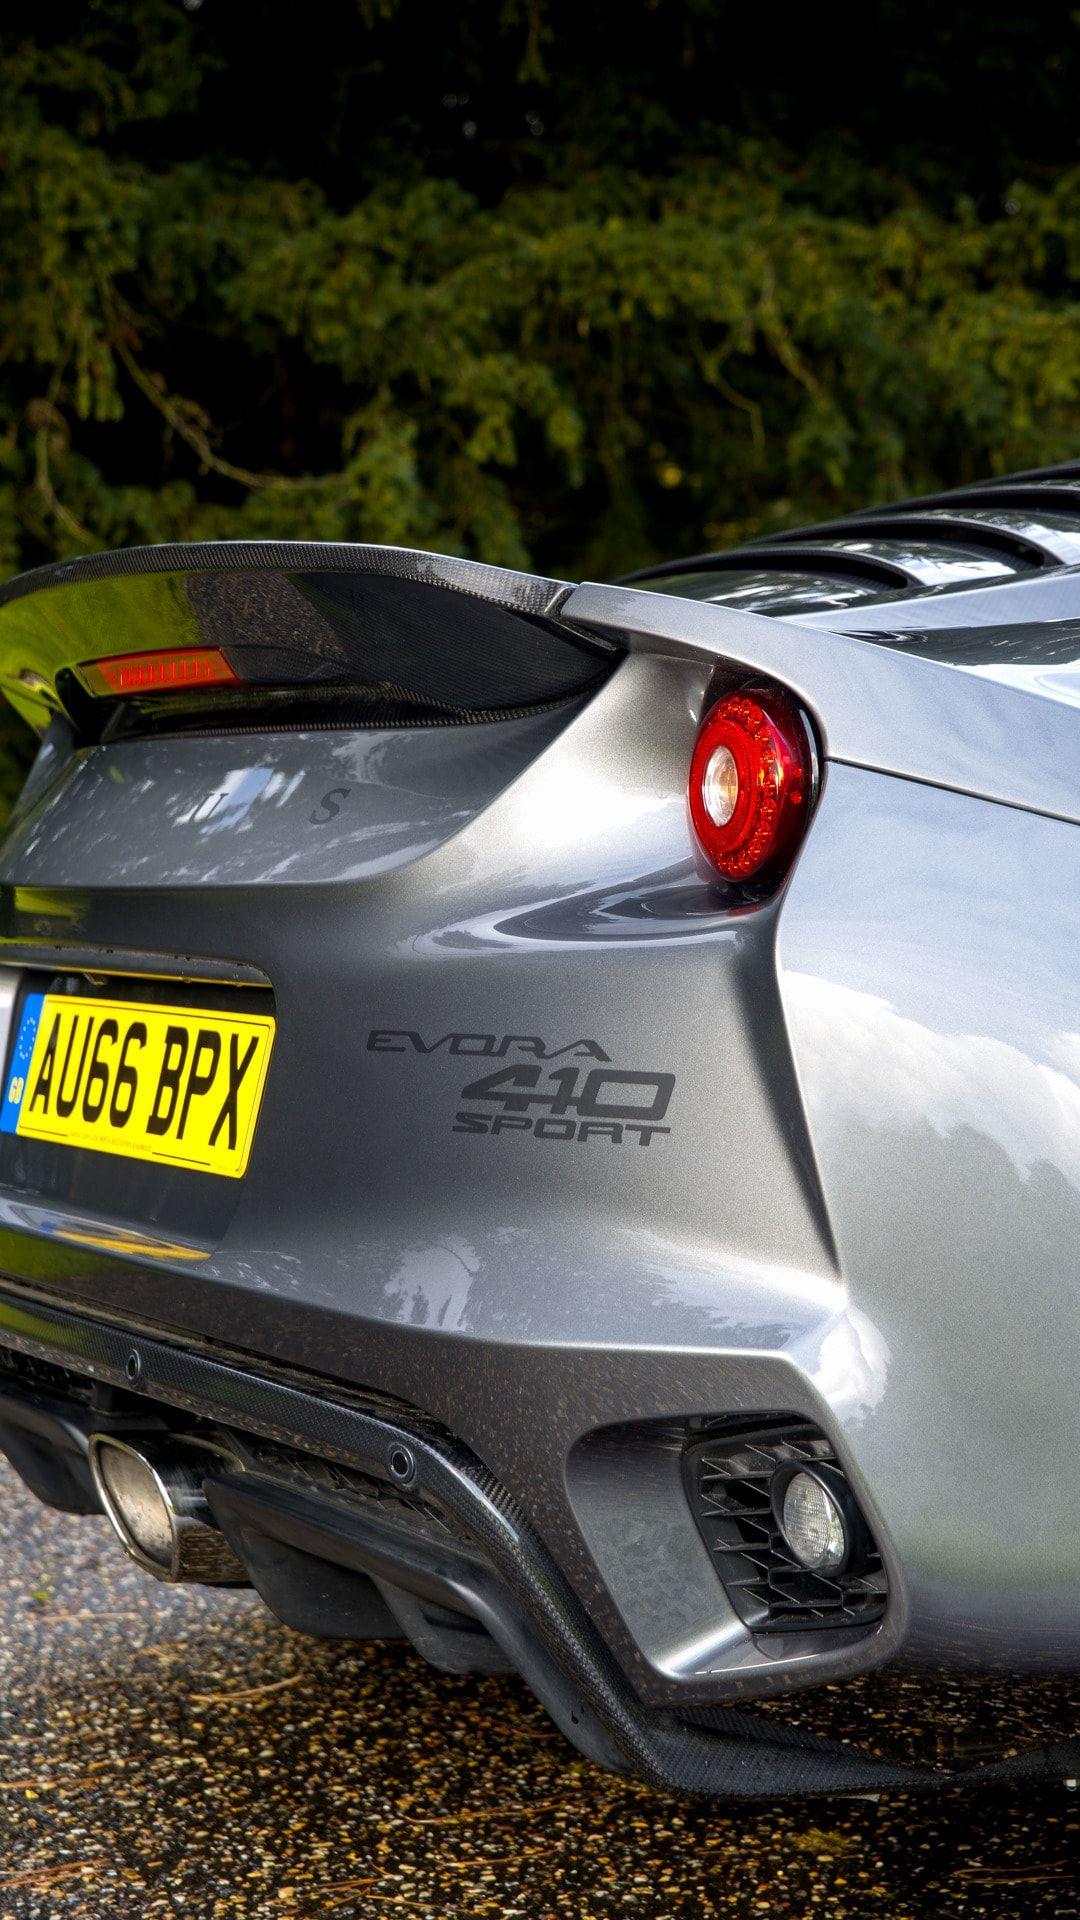 Lotus Evora 410 #Lotus #Evora410 #RaceCar   Lotus cars   Pinterest ...